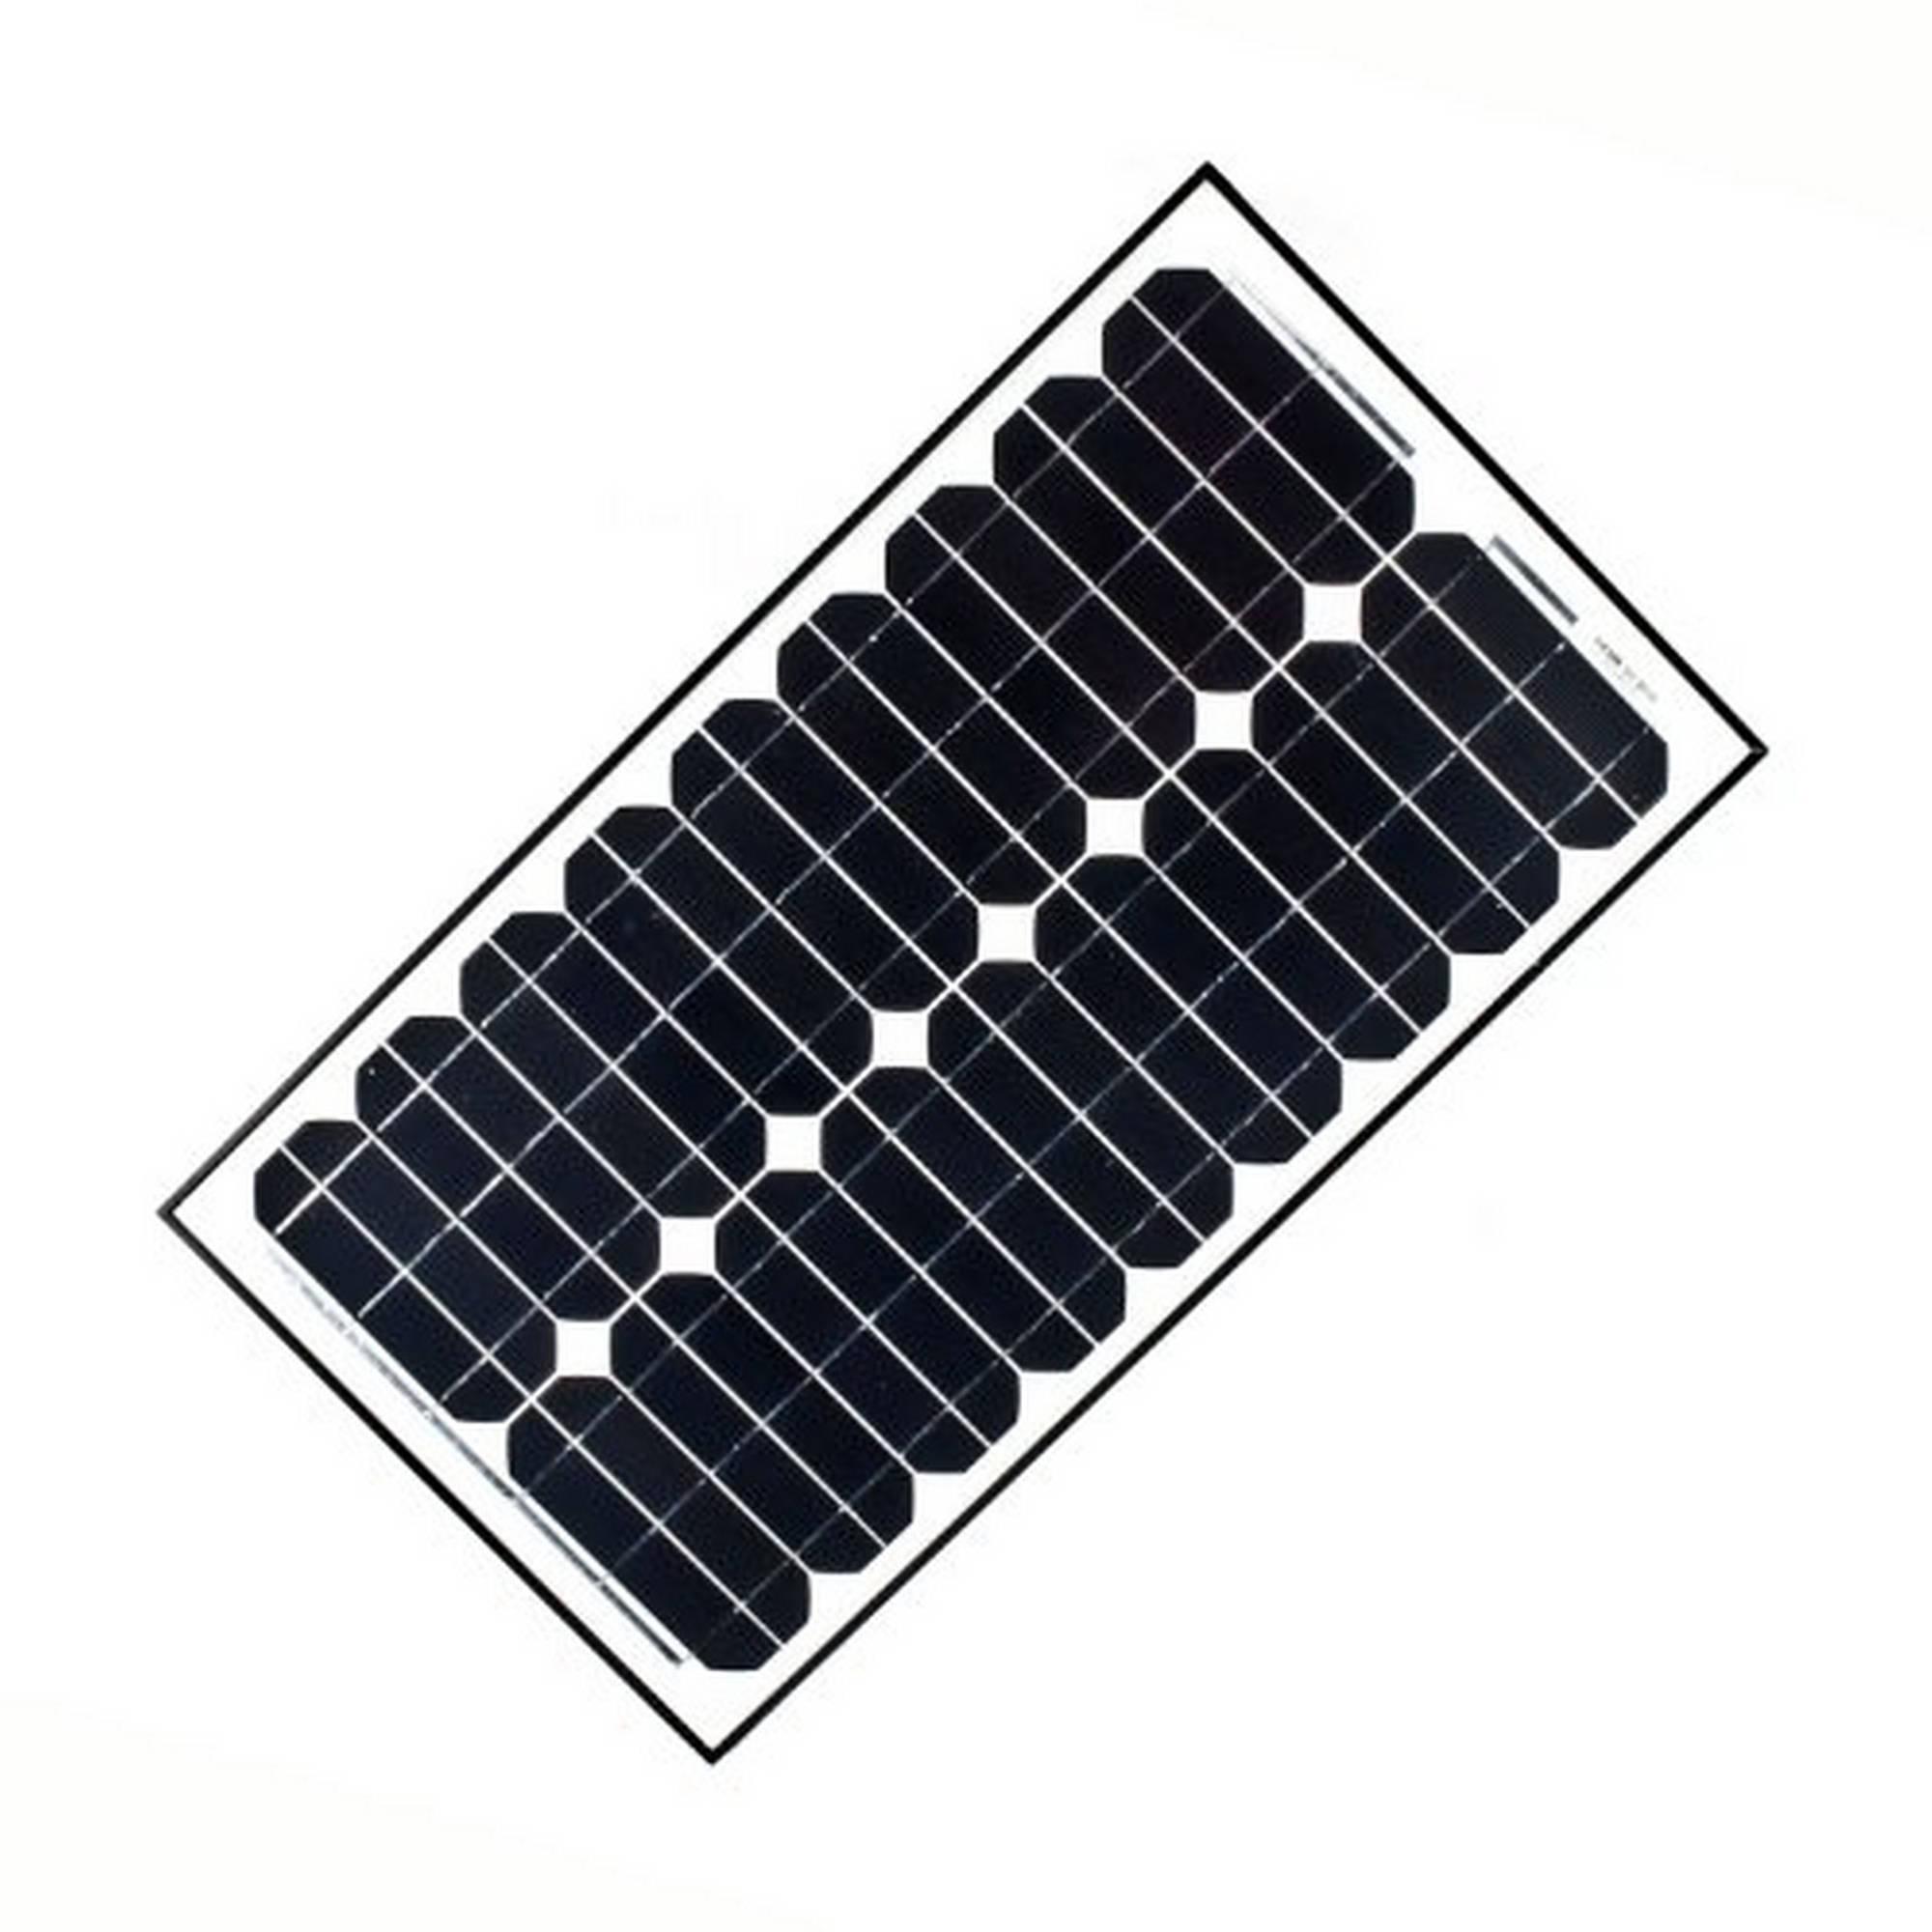 ALEKO Solar Panel Monocrystalline 30W for any DC 12V Application (gate opener, portable charging system, etc.)